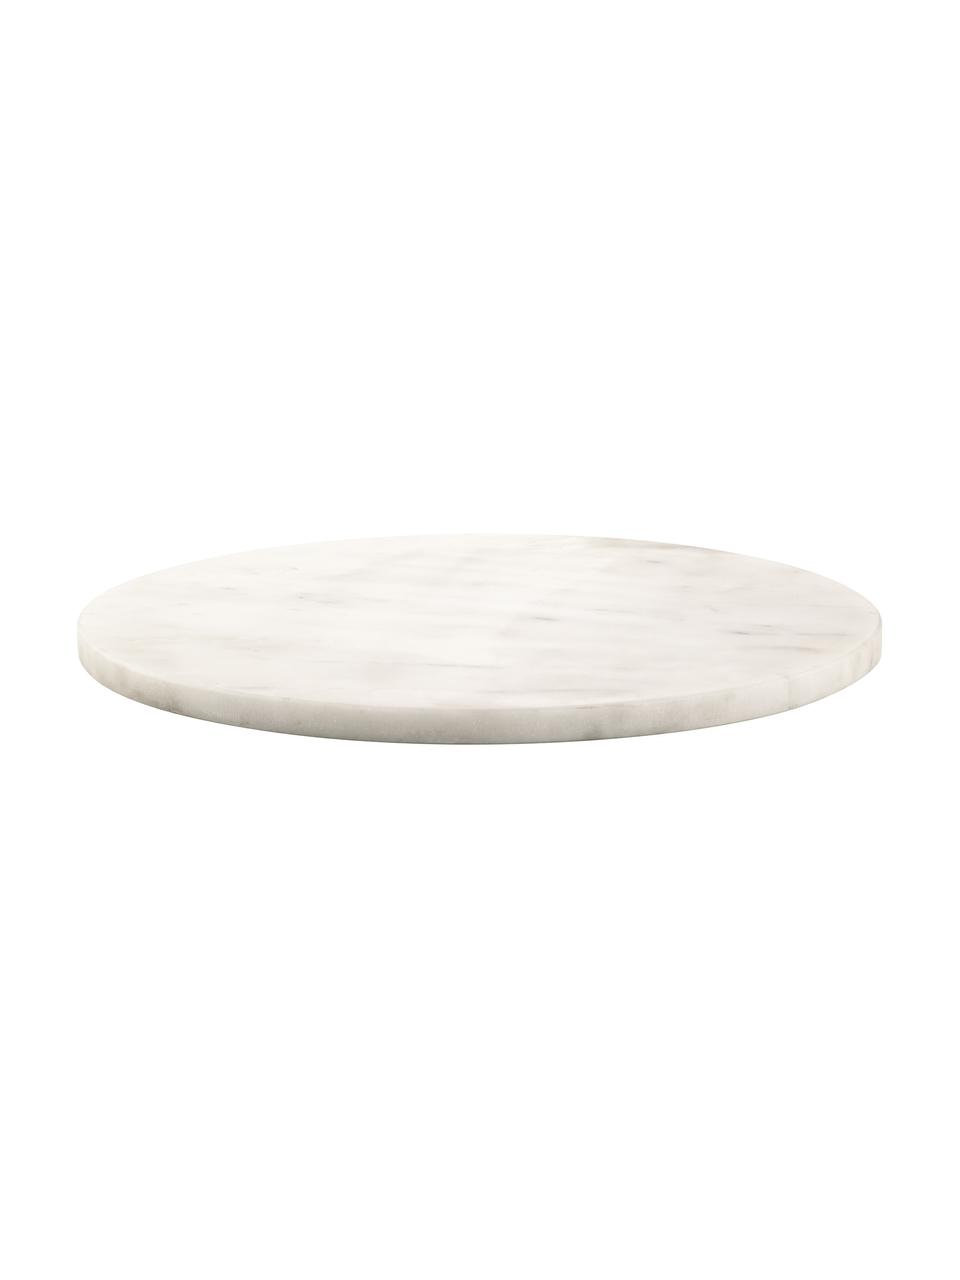 Marmor-Servierplatte Minu, Ø 30 cm, Marmor, Weiß, Ø 30 cm